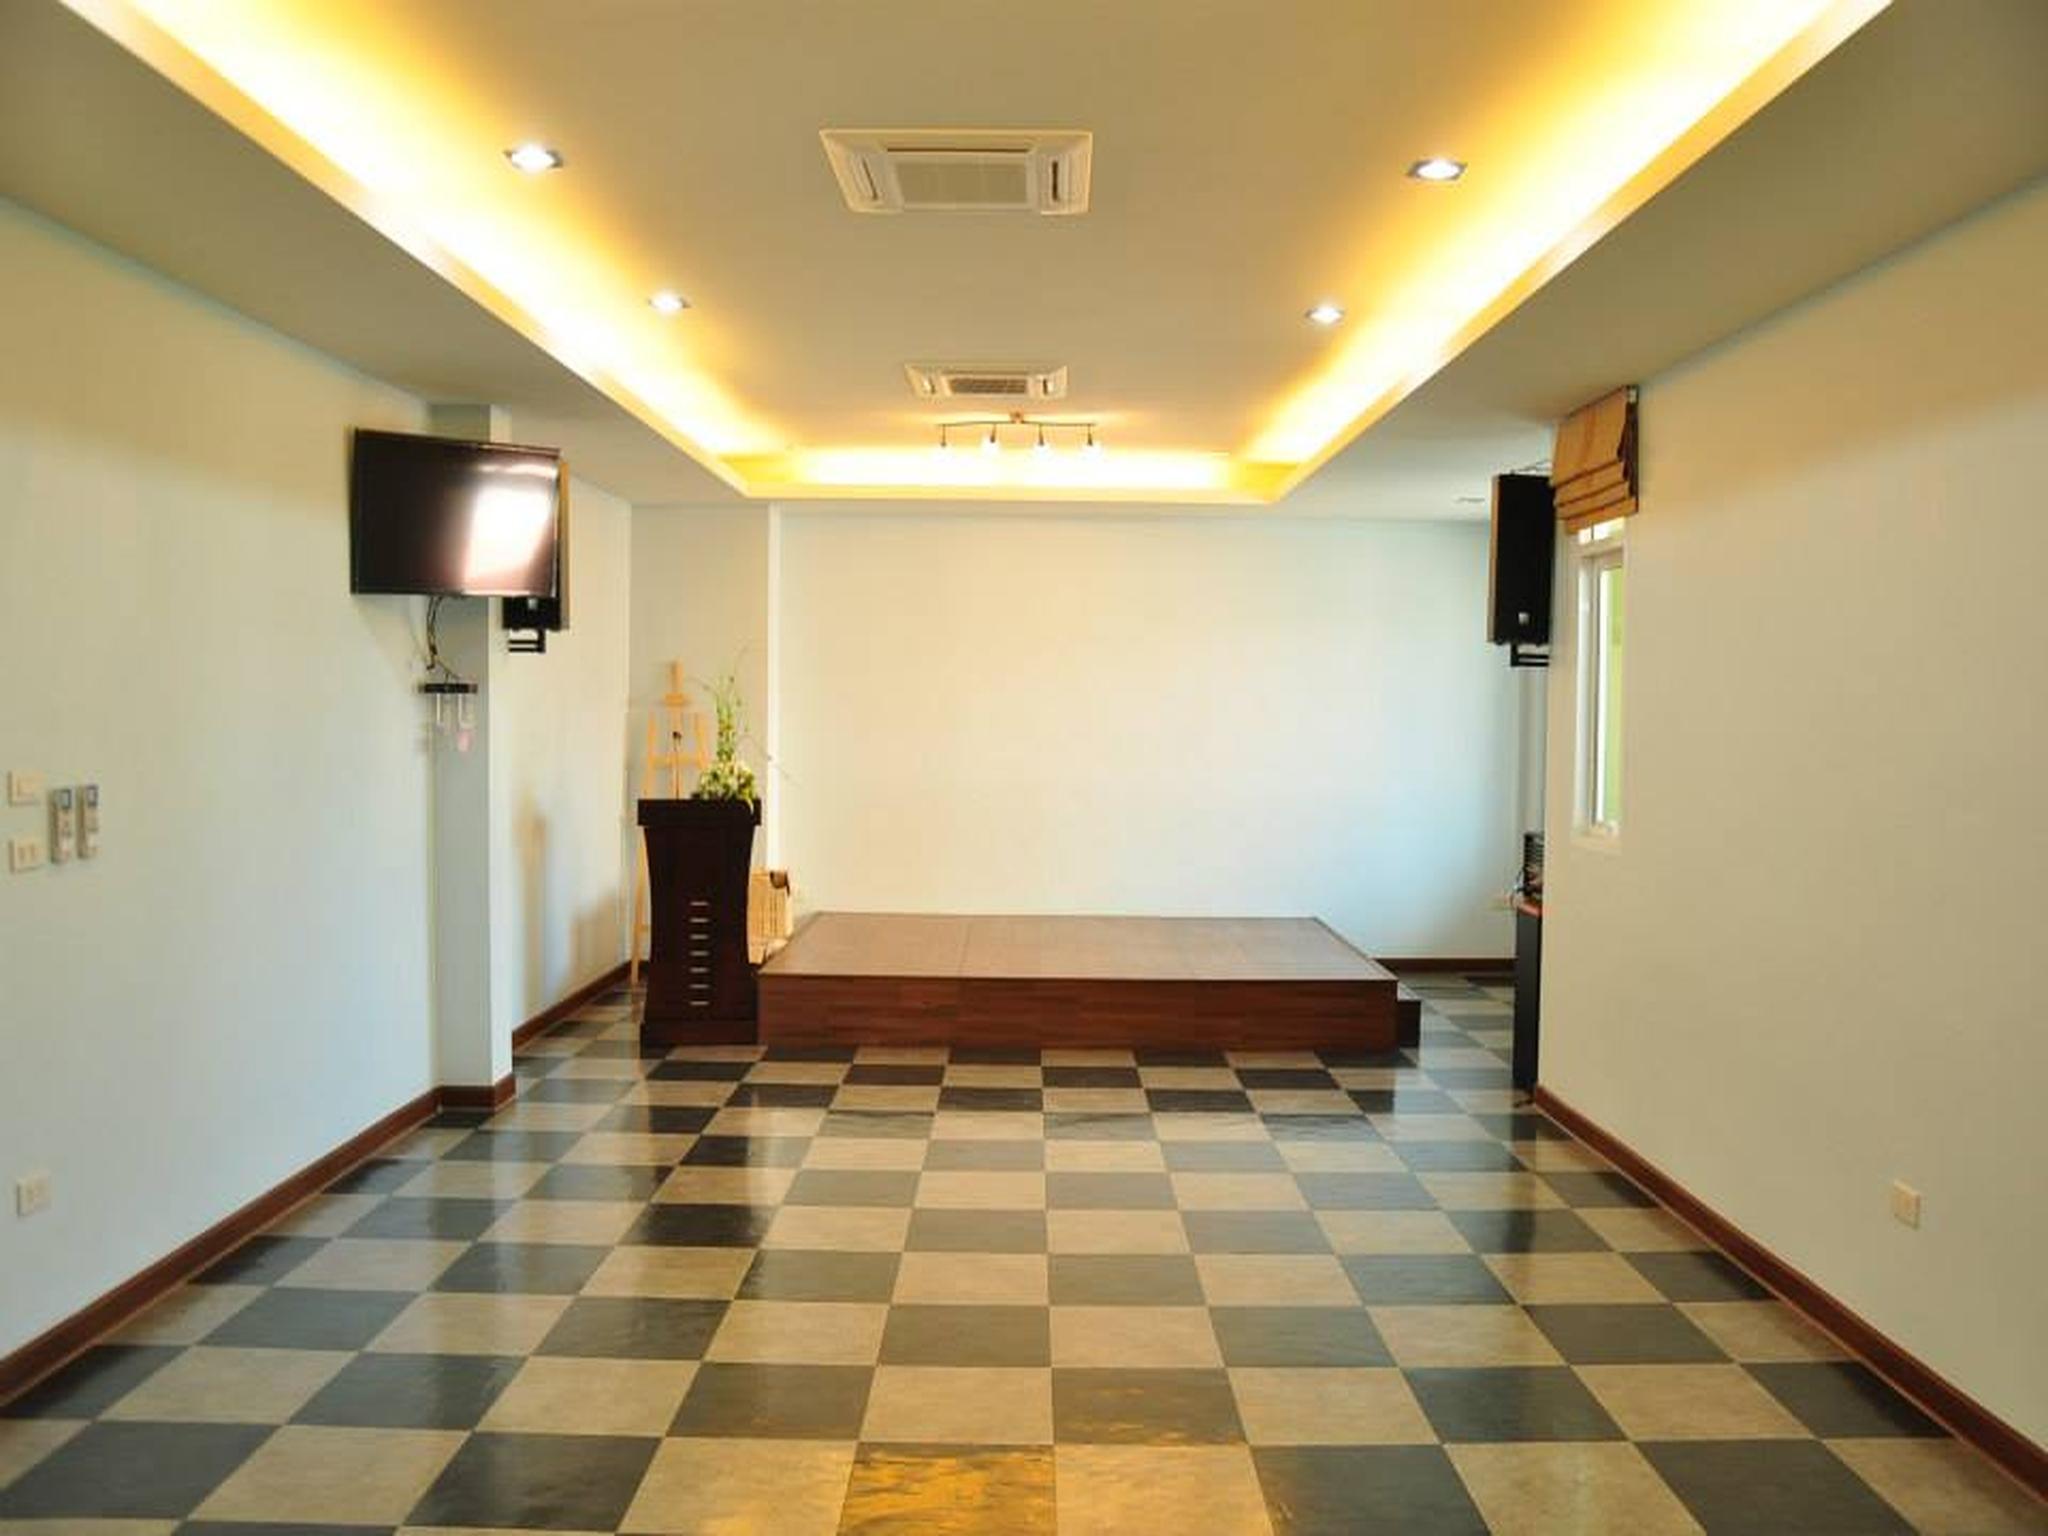 The Room Phatthalung,เดอะ รูม พัทลุง